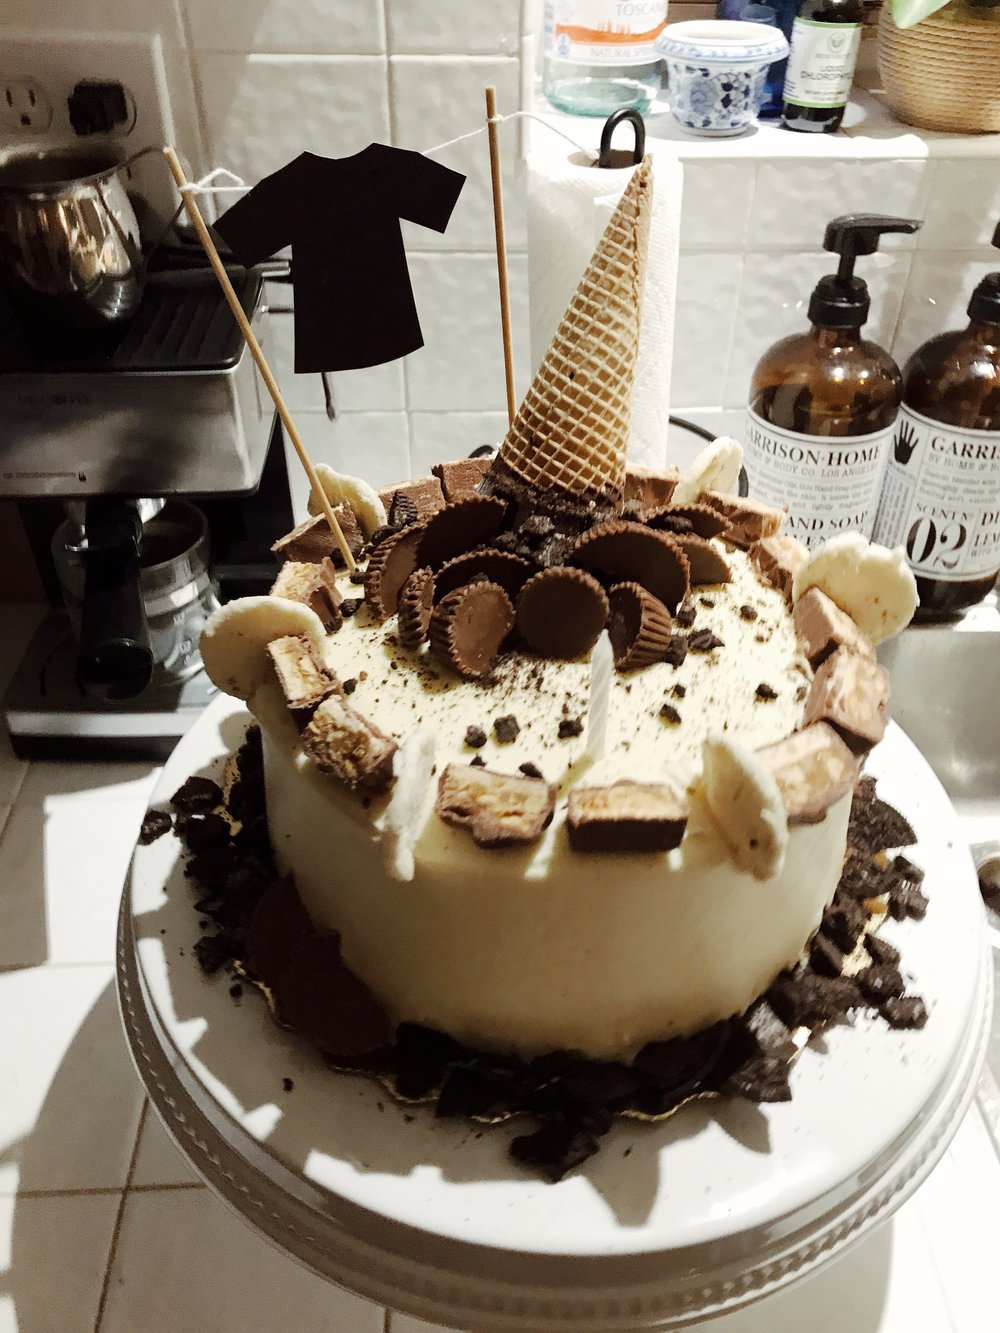 diy cake decor ice cream cone chocolate oreo birthday cake